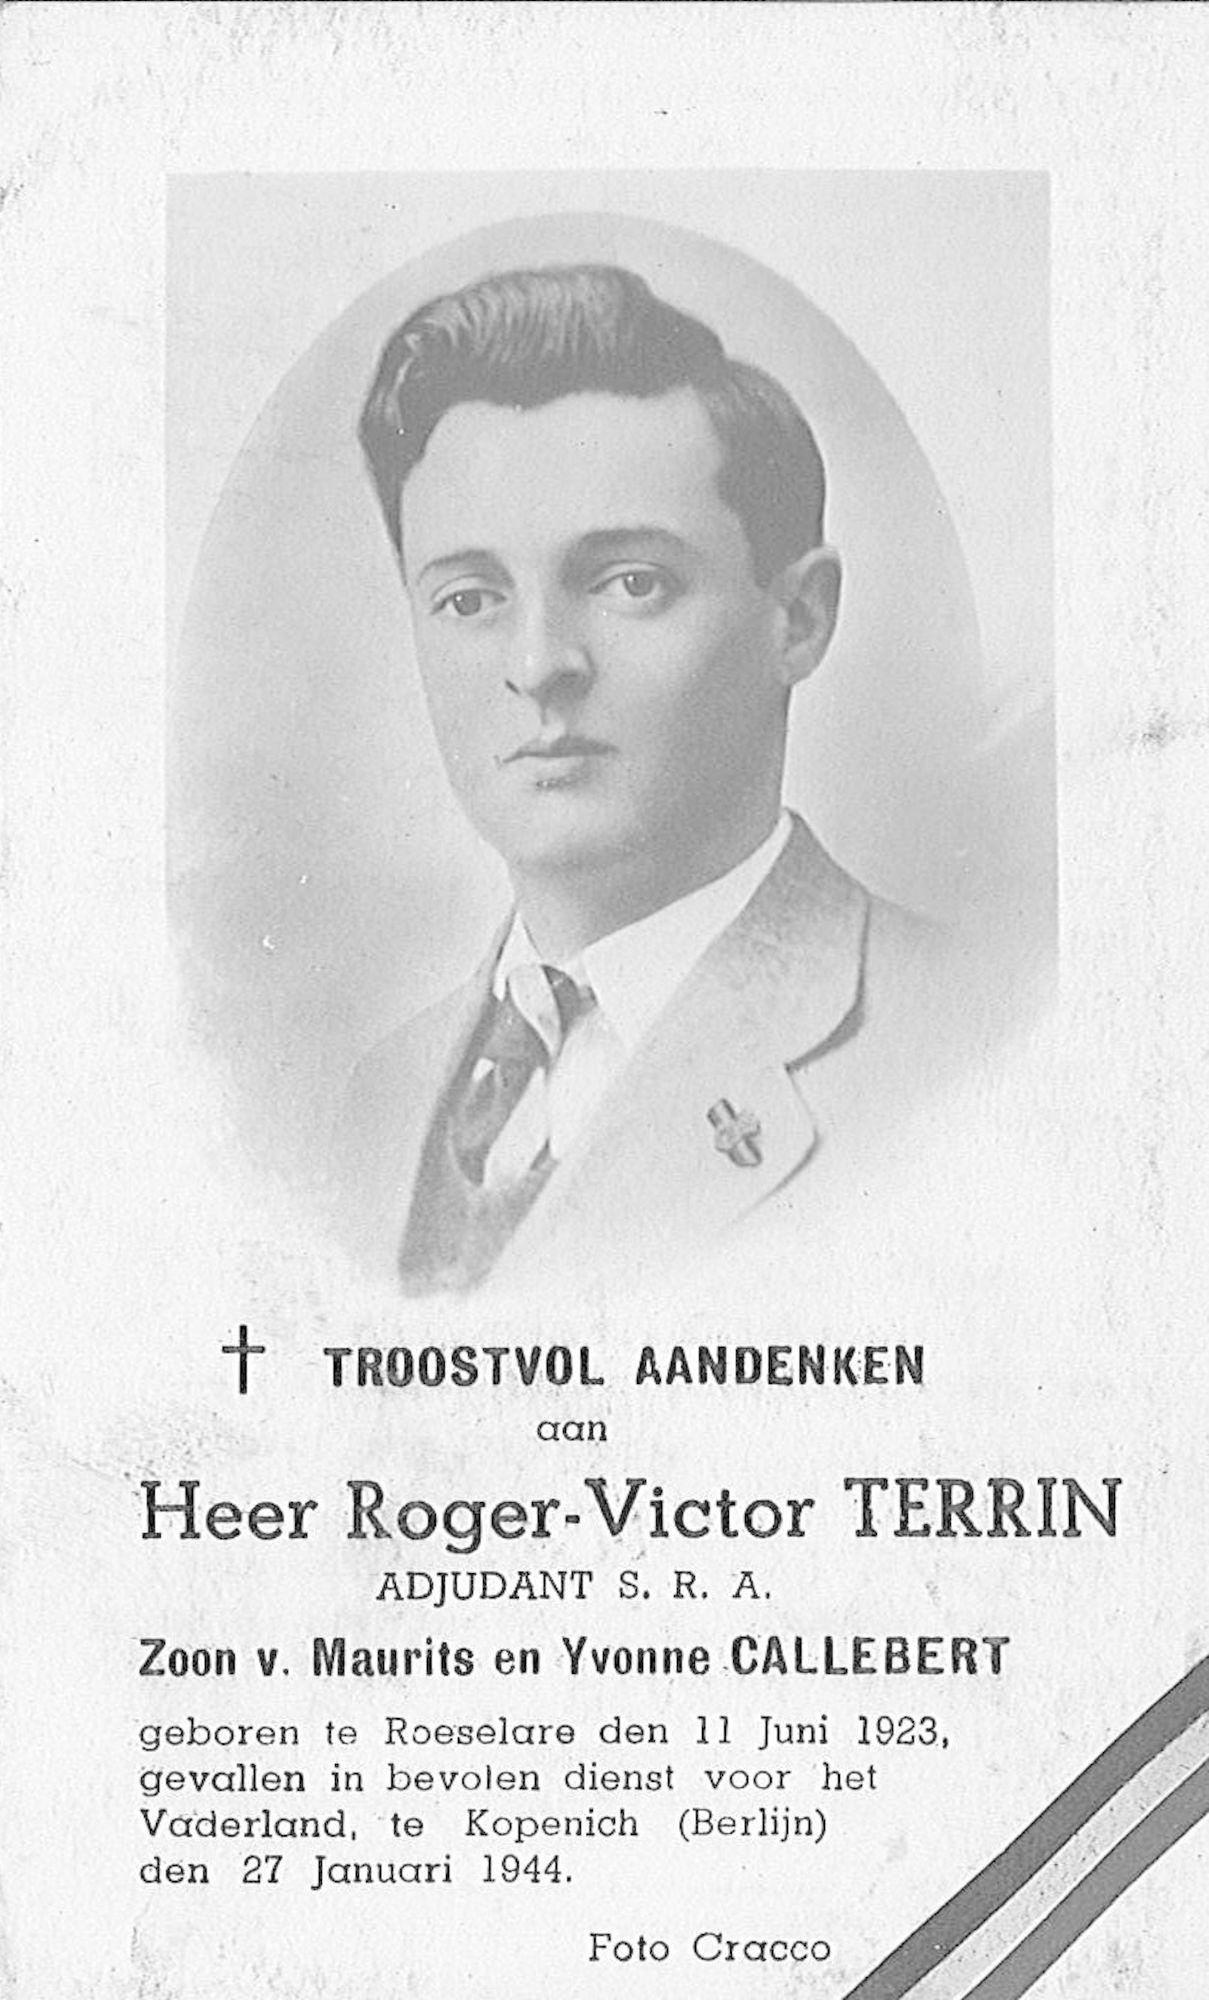 Roger-Victor Terrin